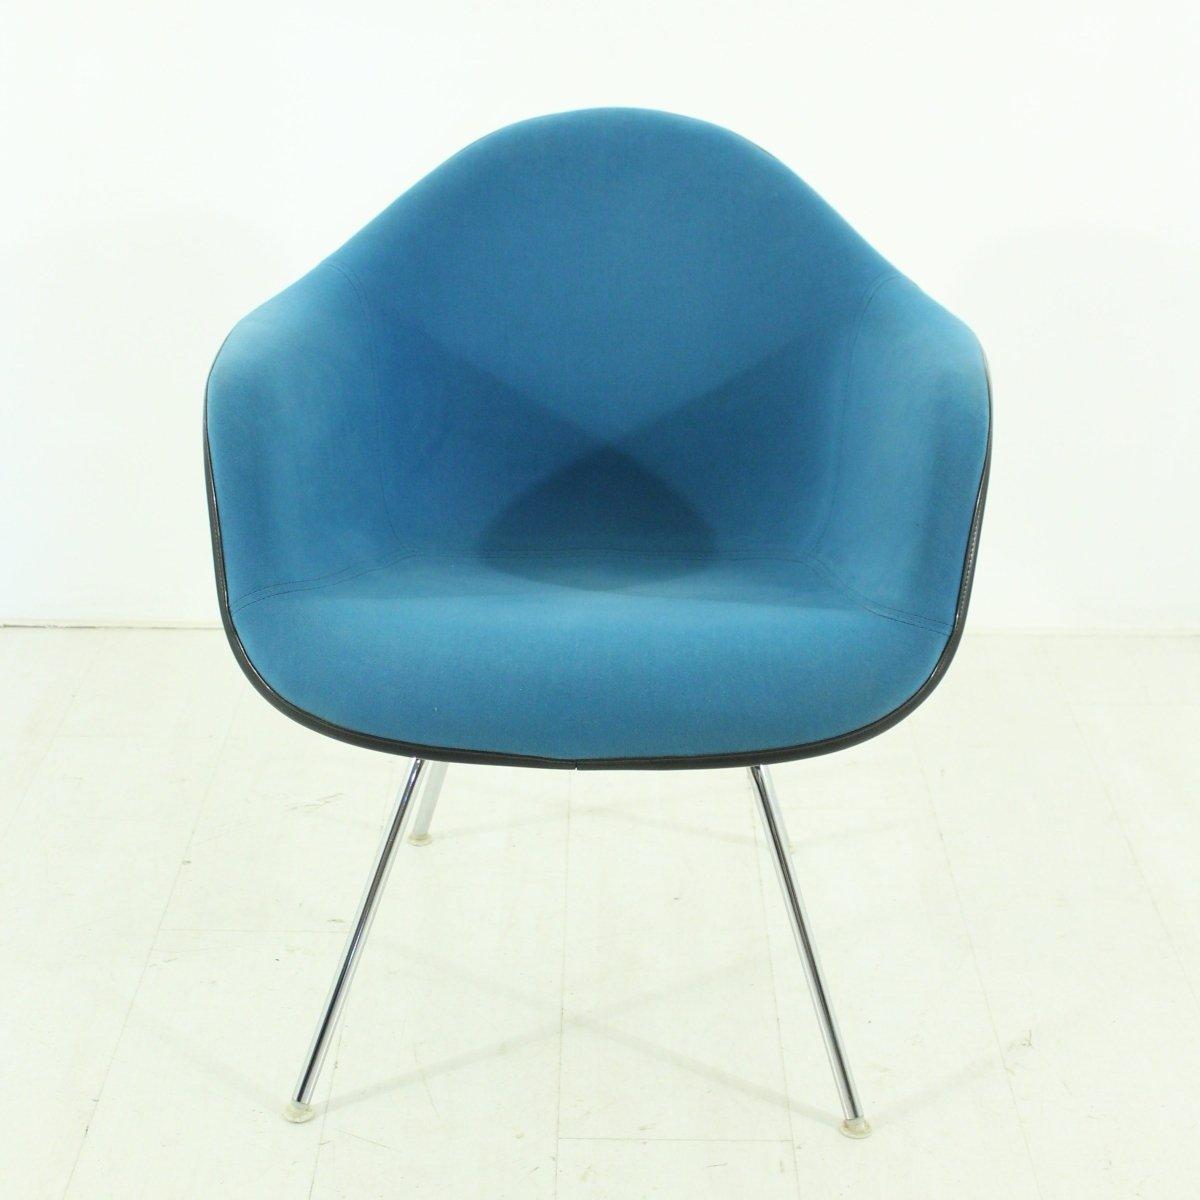 Chaise vintage bleue par charles ray eames pour vitra en for Chaise vitra eames prix